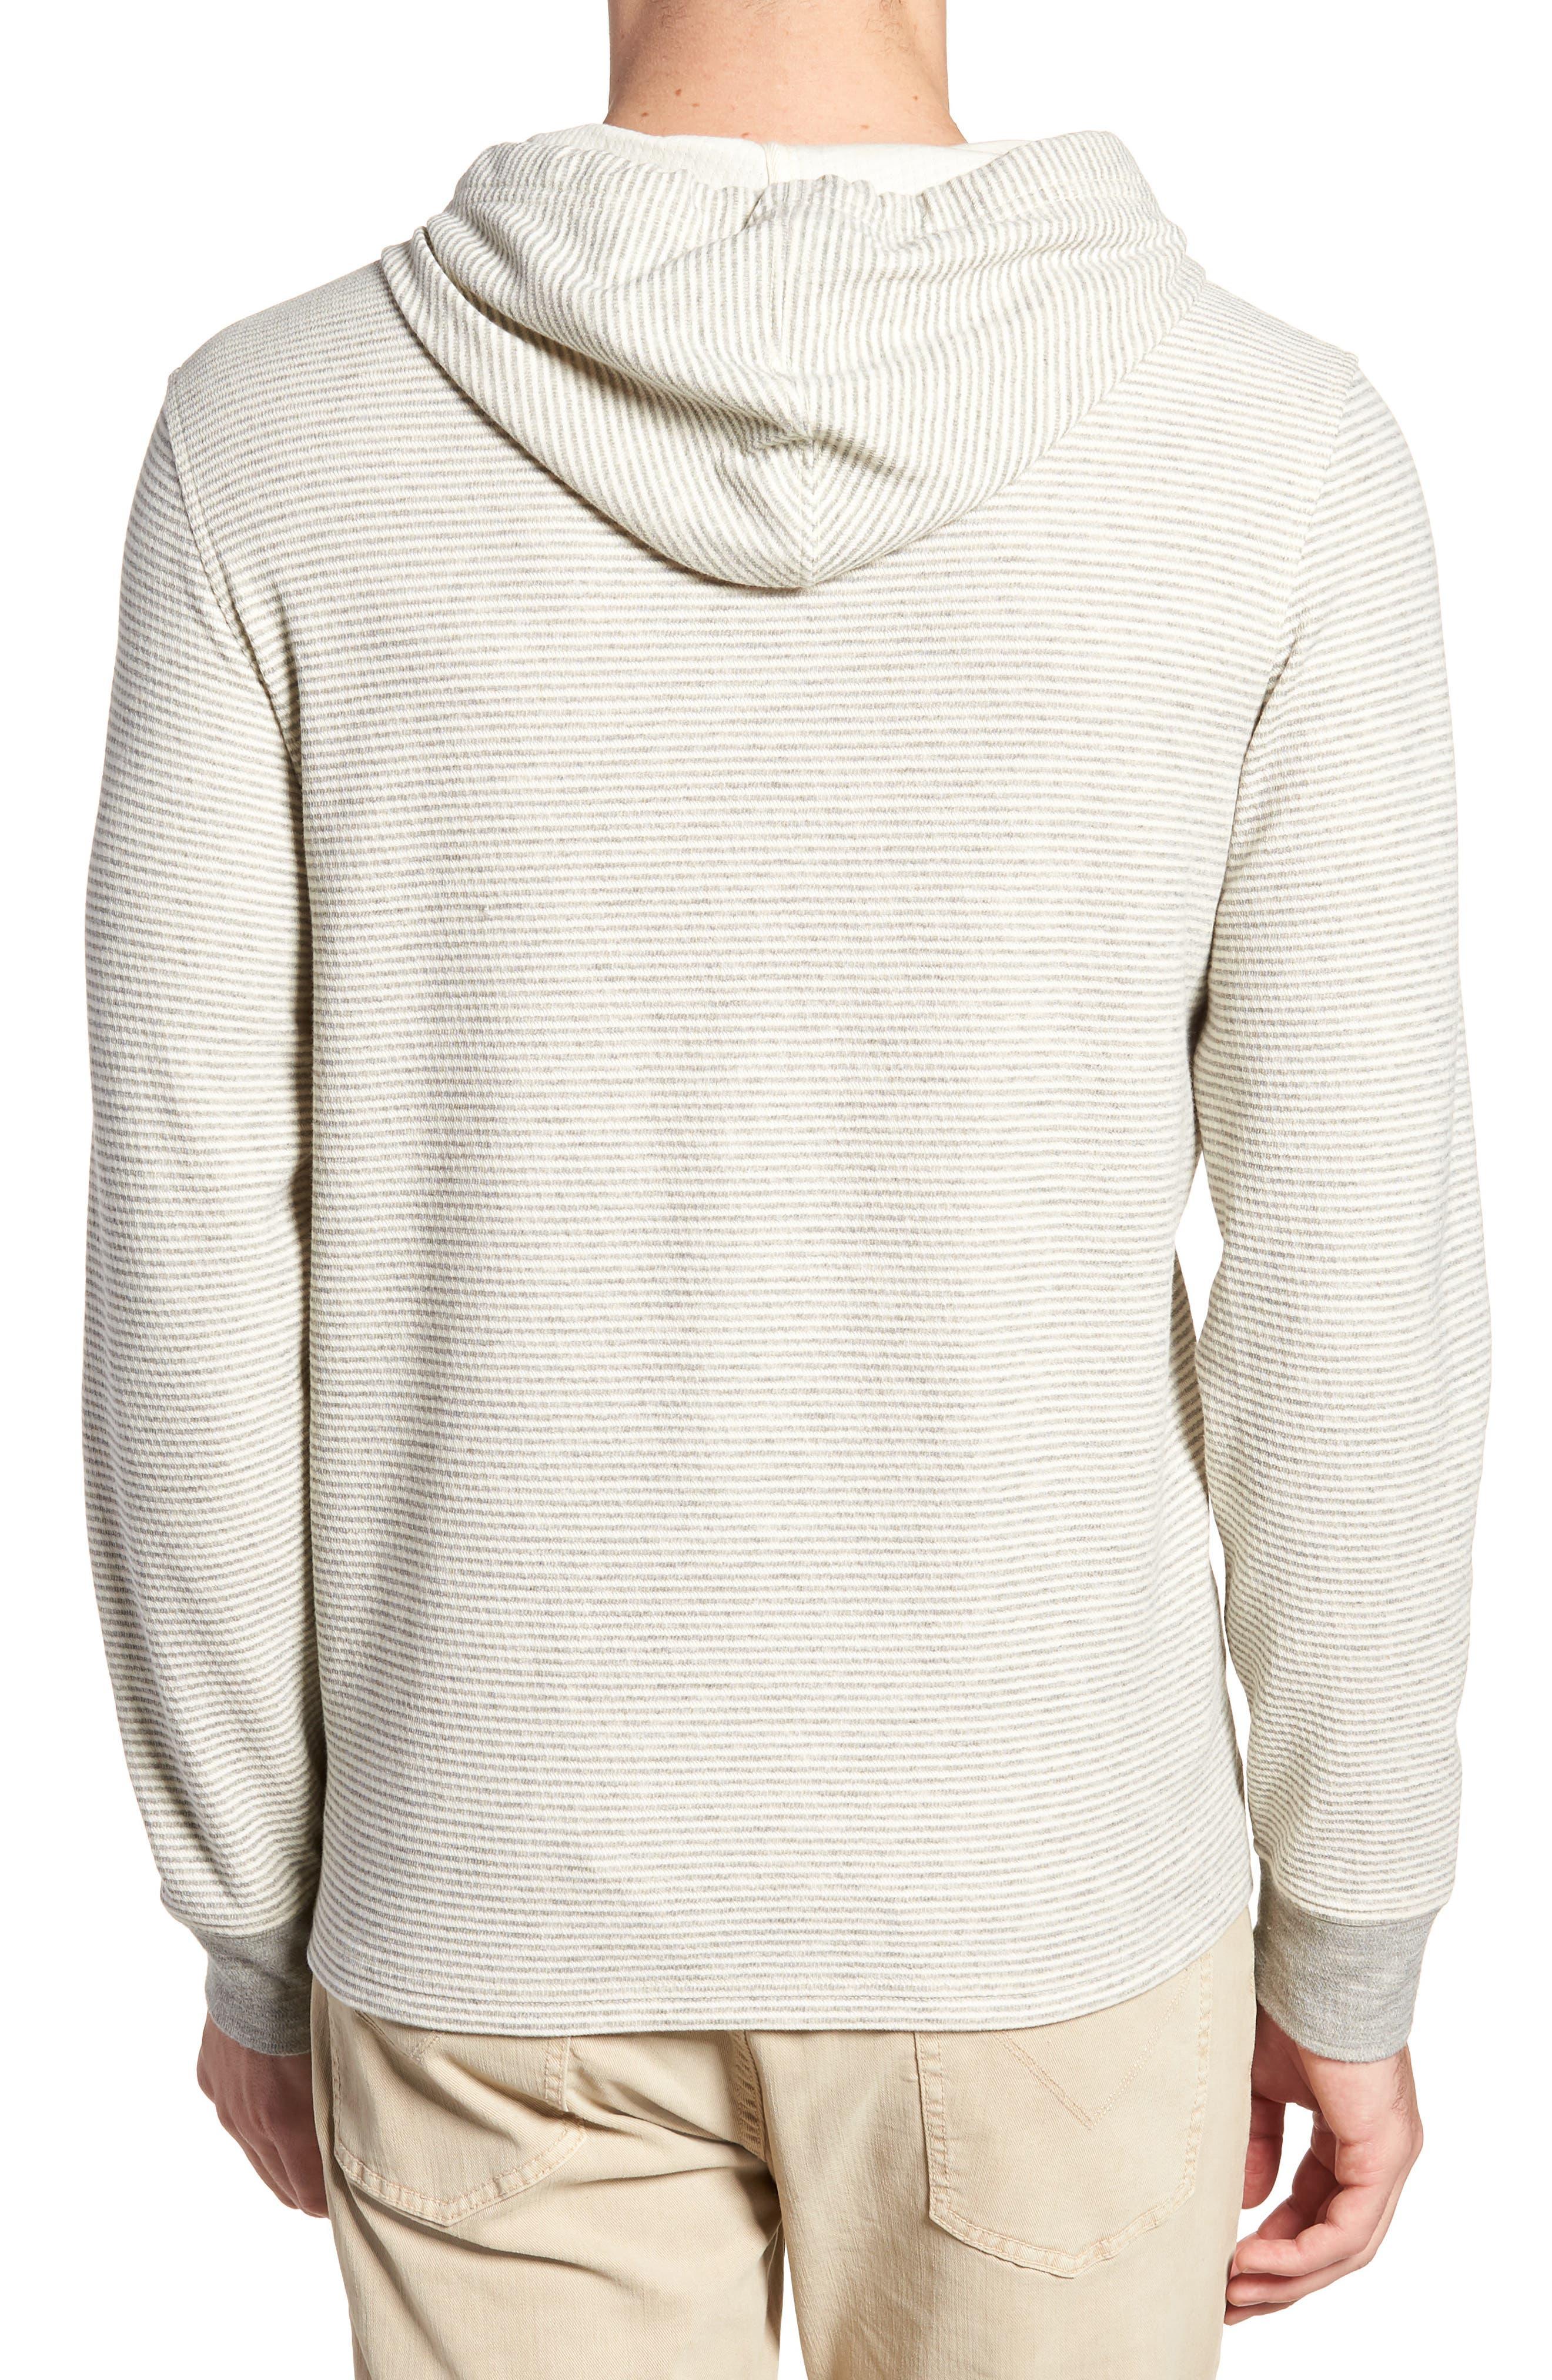 Cotton Blend Hoodie,                             Alternate thumbnail 2, color,                             Grey/ Natural